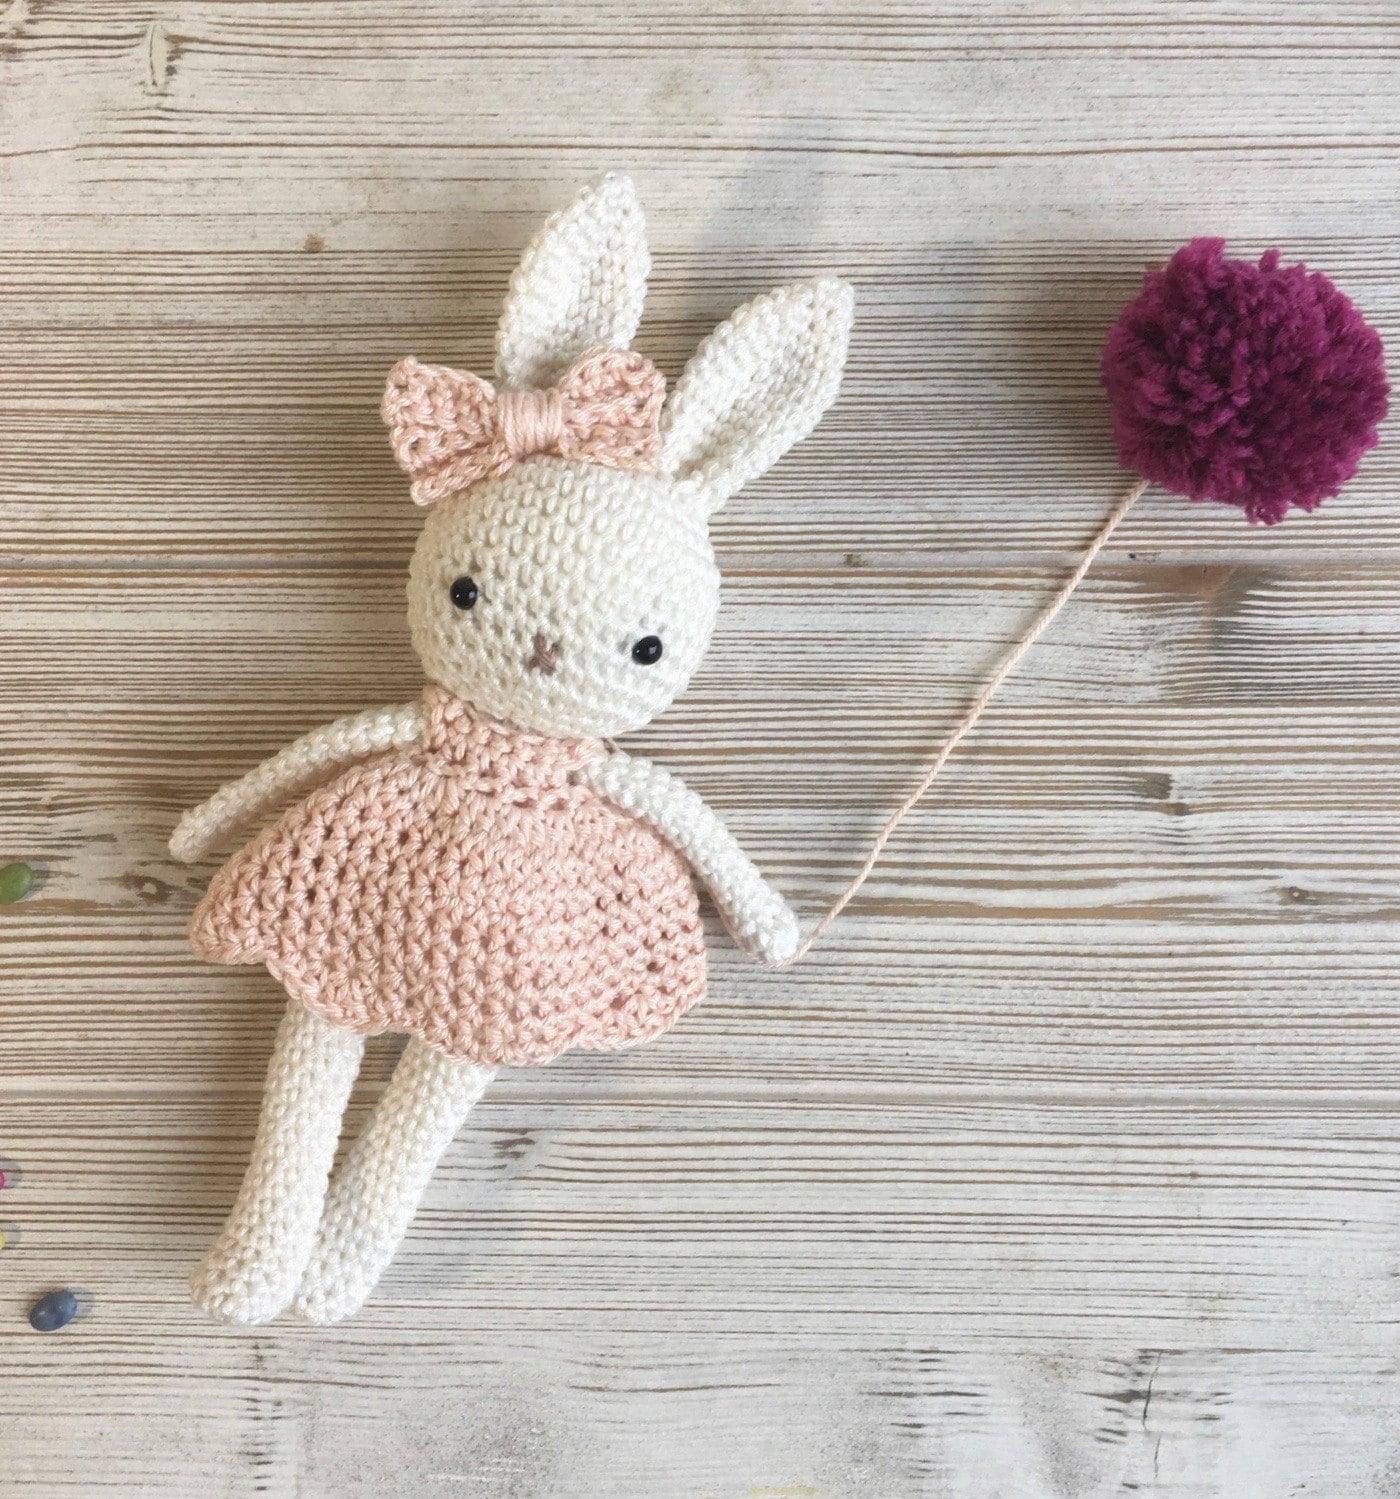 Amigurumi bunny girlcrochet bunny crochet toybaby bunny